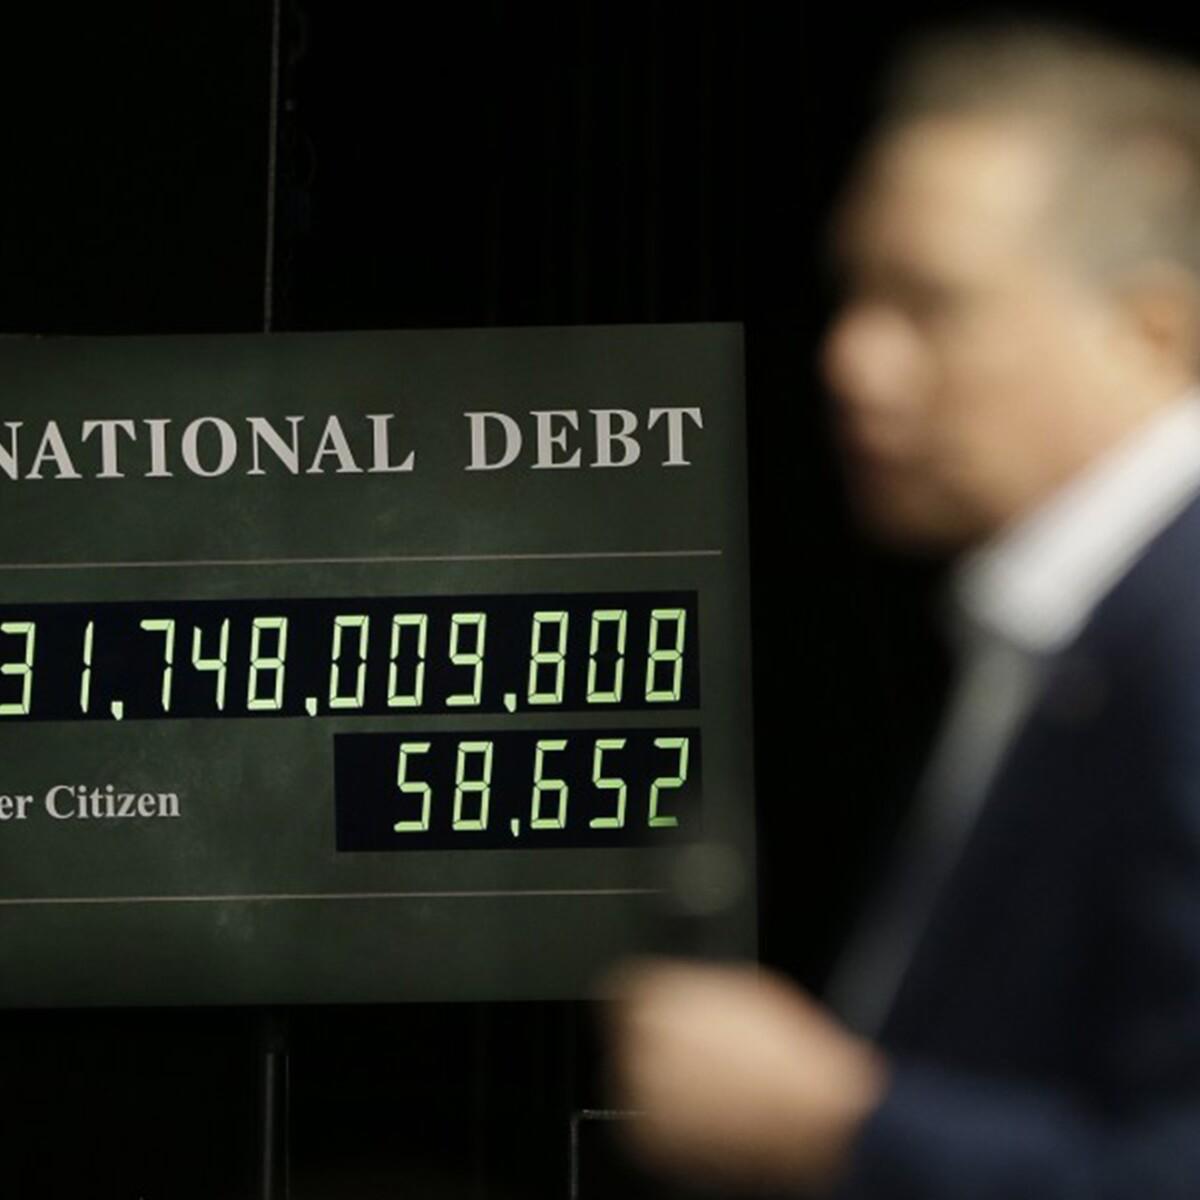 National debt hits 21 trillion